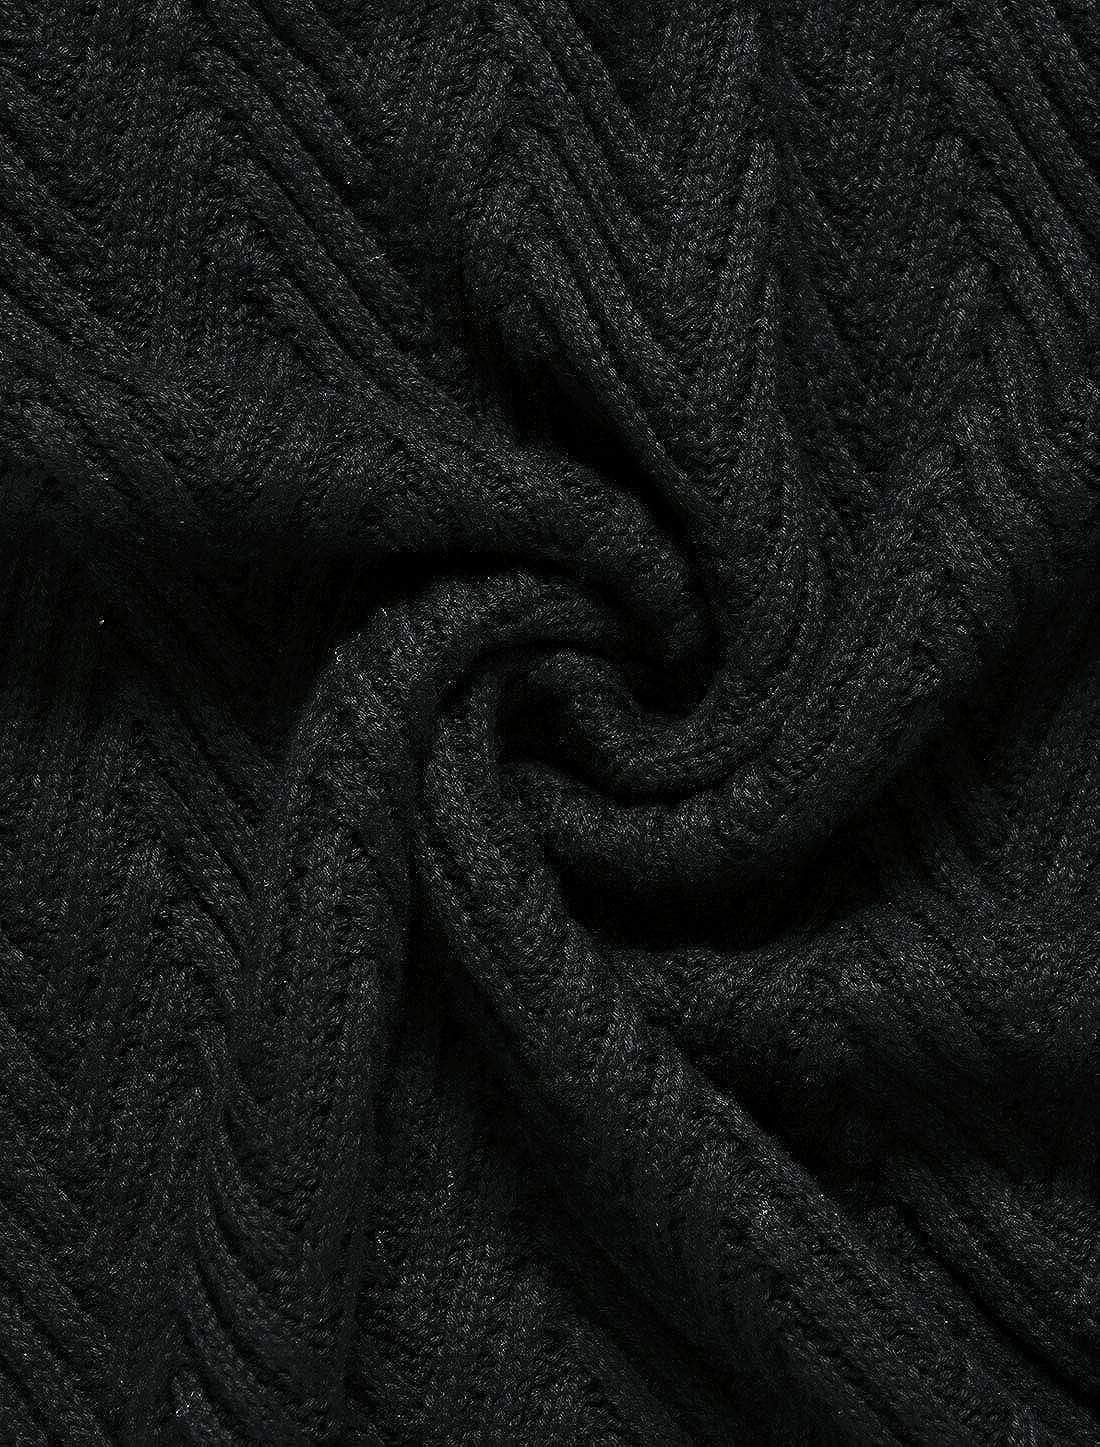 Agnes Orinda Women's Plus Size Turtleneck Side Slit Long Sleeve Mock Sweater Tunic Mothers Day